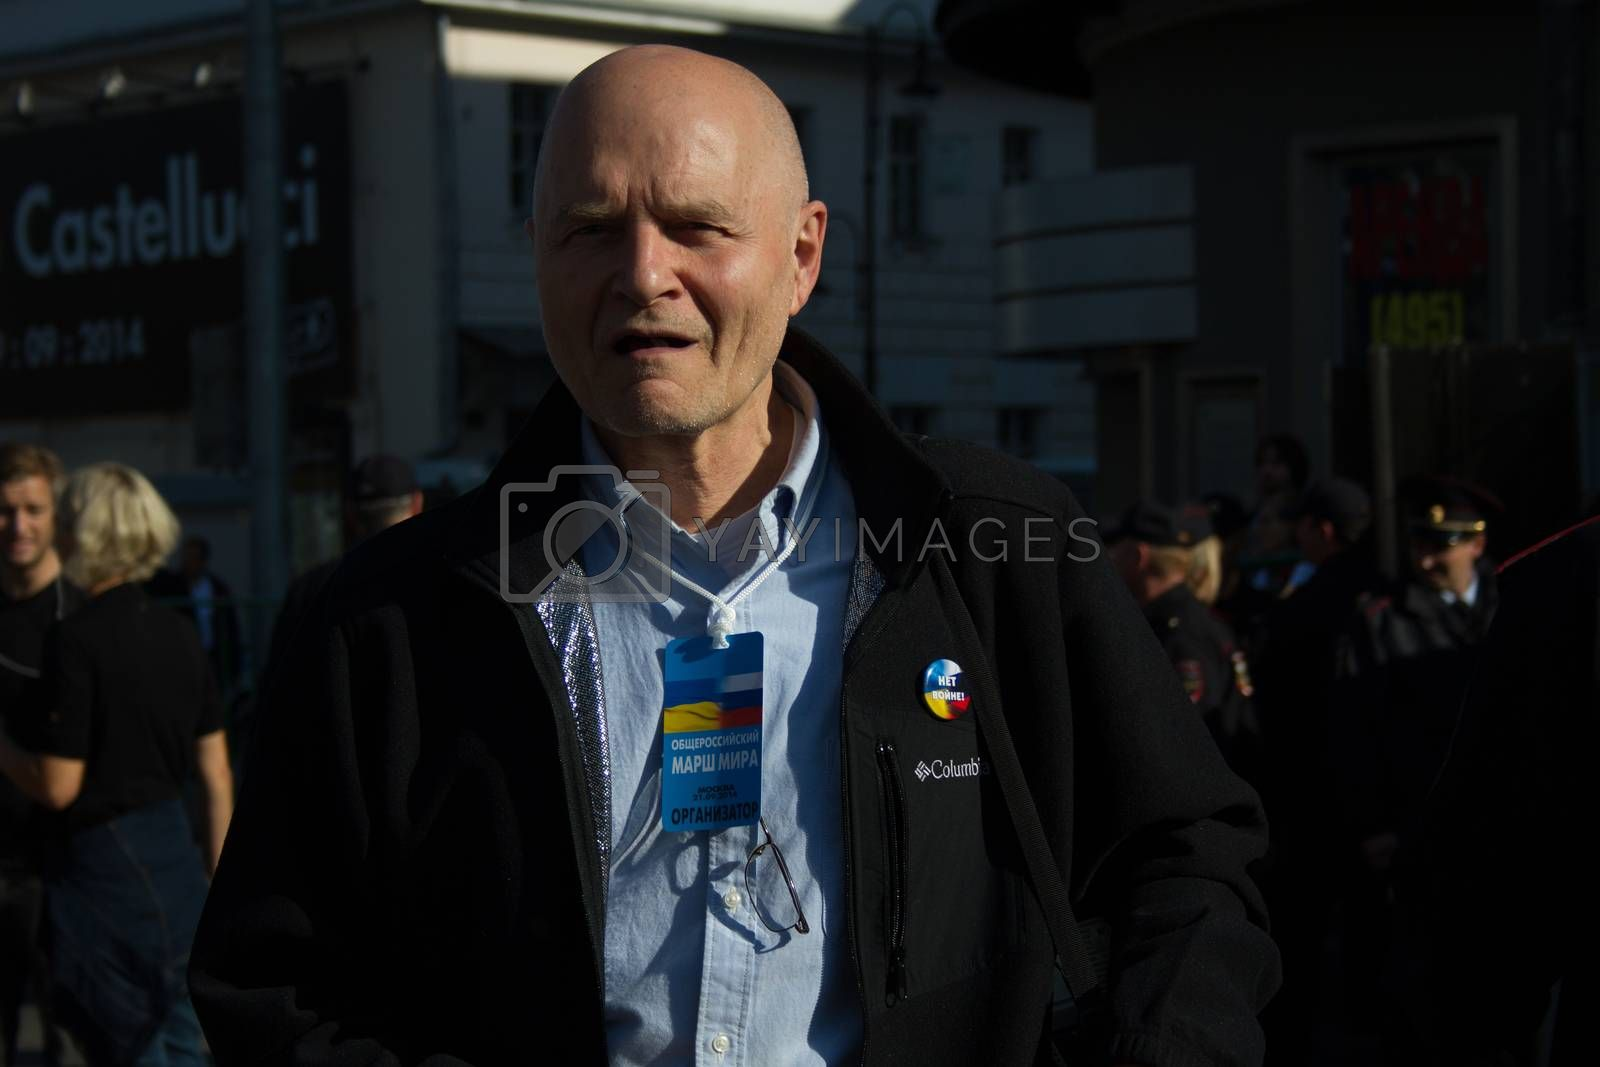 Royalty free image of Co-organizer March of peace Michael Schneider by olegkozyrev